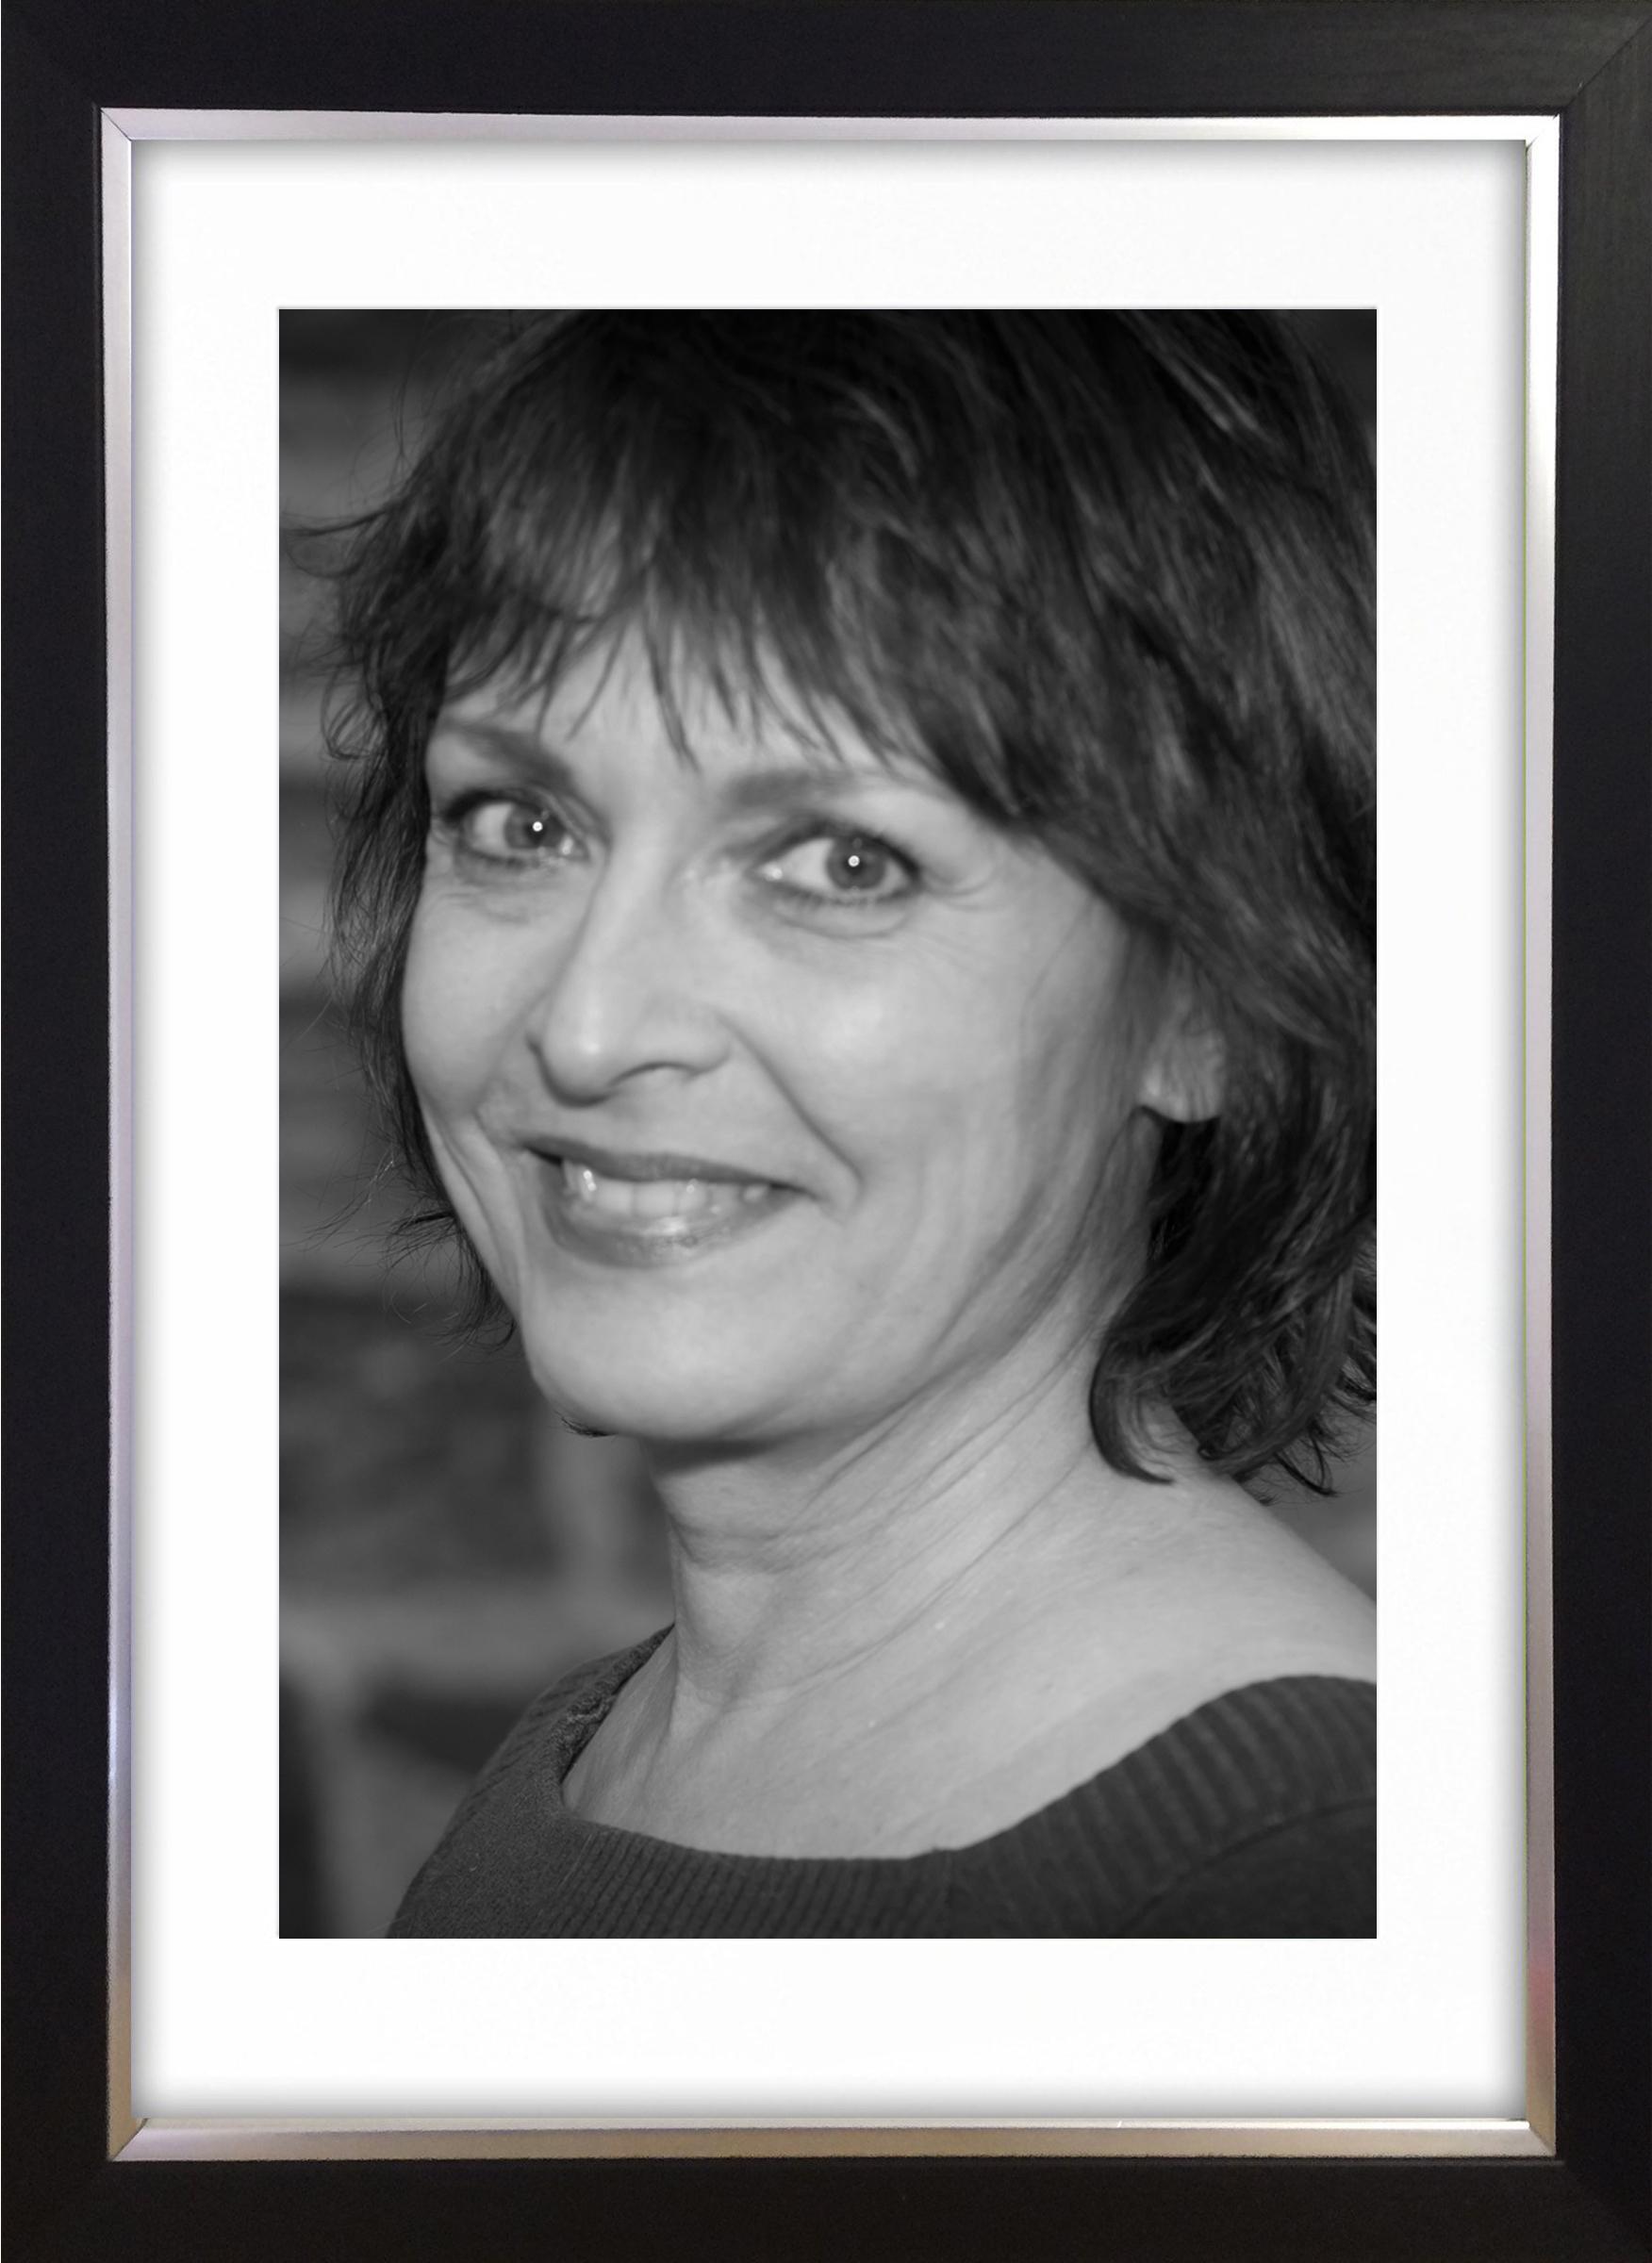 Catherine Oxenberg born September 22, 1961 (age 57) Hot image Erik J. Berg,Suzanne Storrs